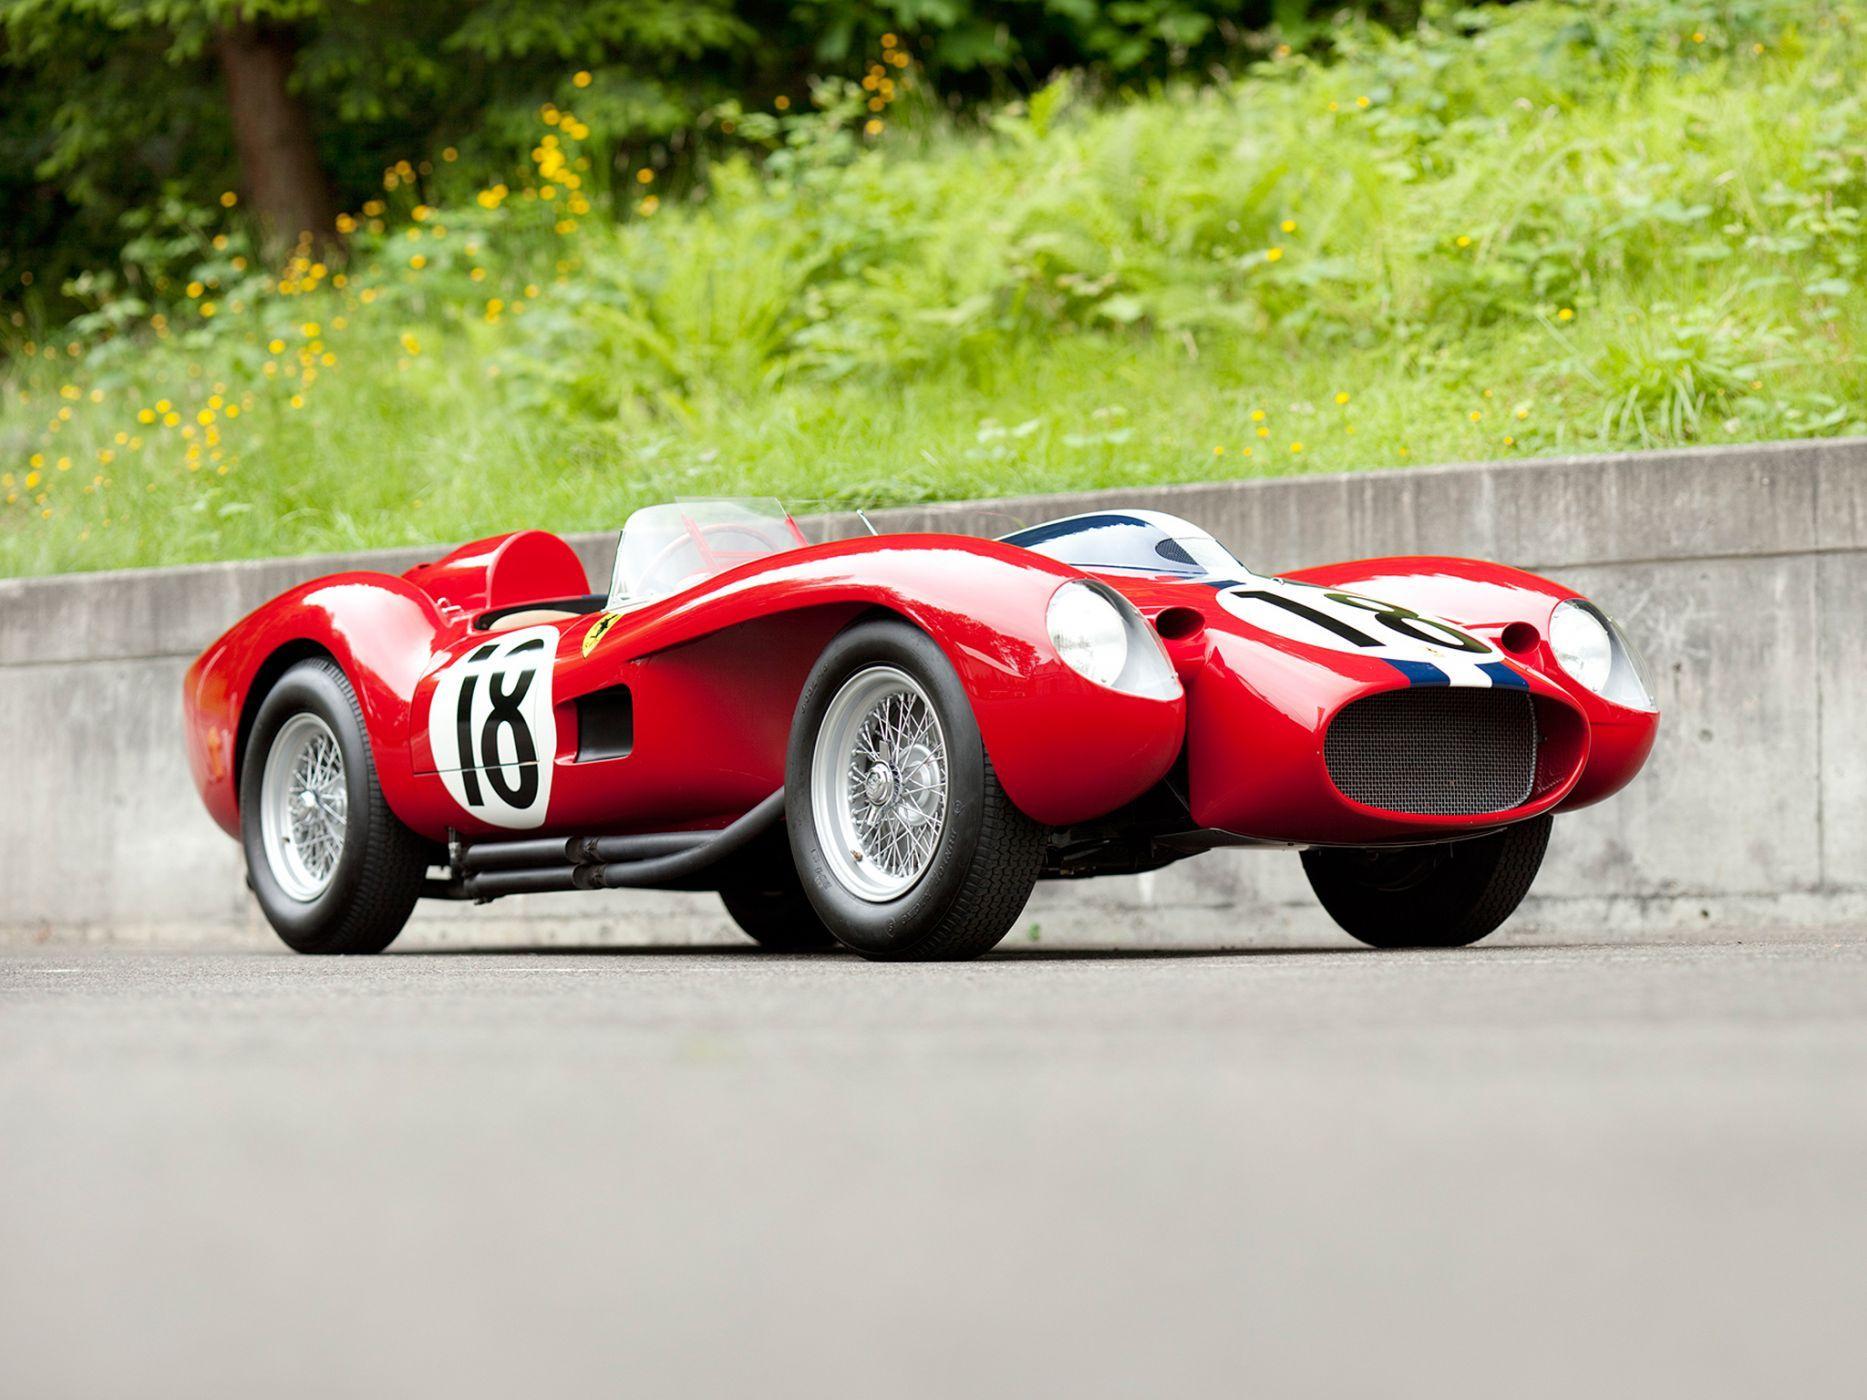 1957 Ferrari 250 Testa Rossa Scaglietti Spyder Supercar Retro Race Racing T Wallpaper Super Cars Ferrari Classic Cars